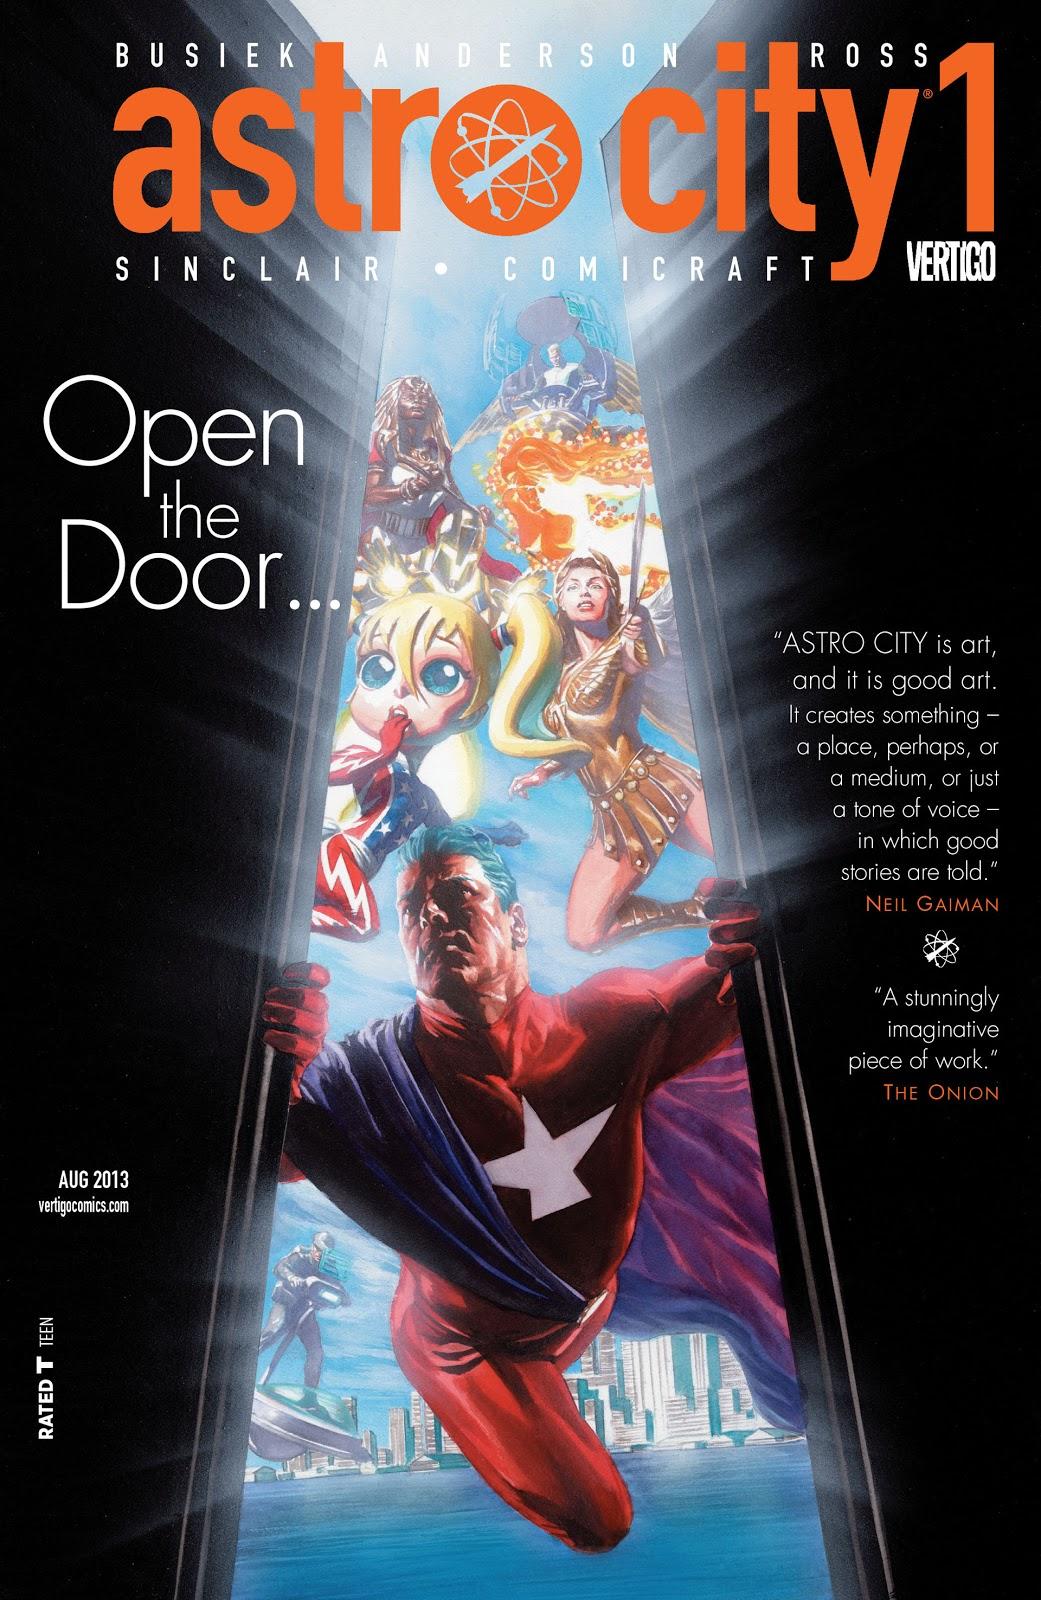 Samaritan opening doors leading to reader's POV, other superheroes behind him